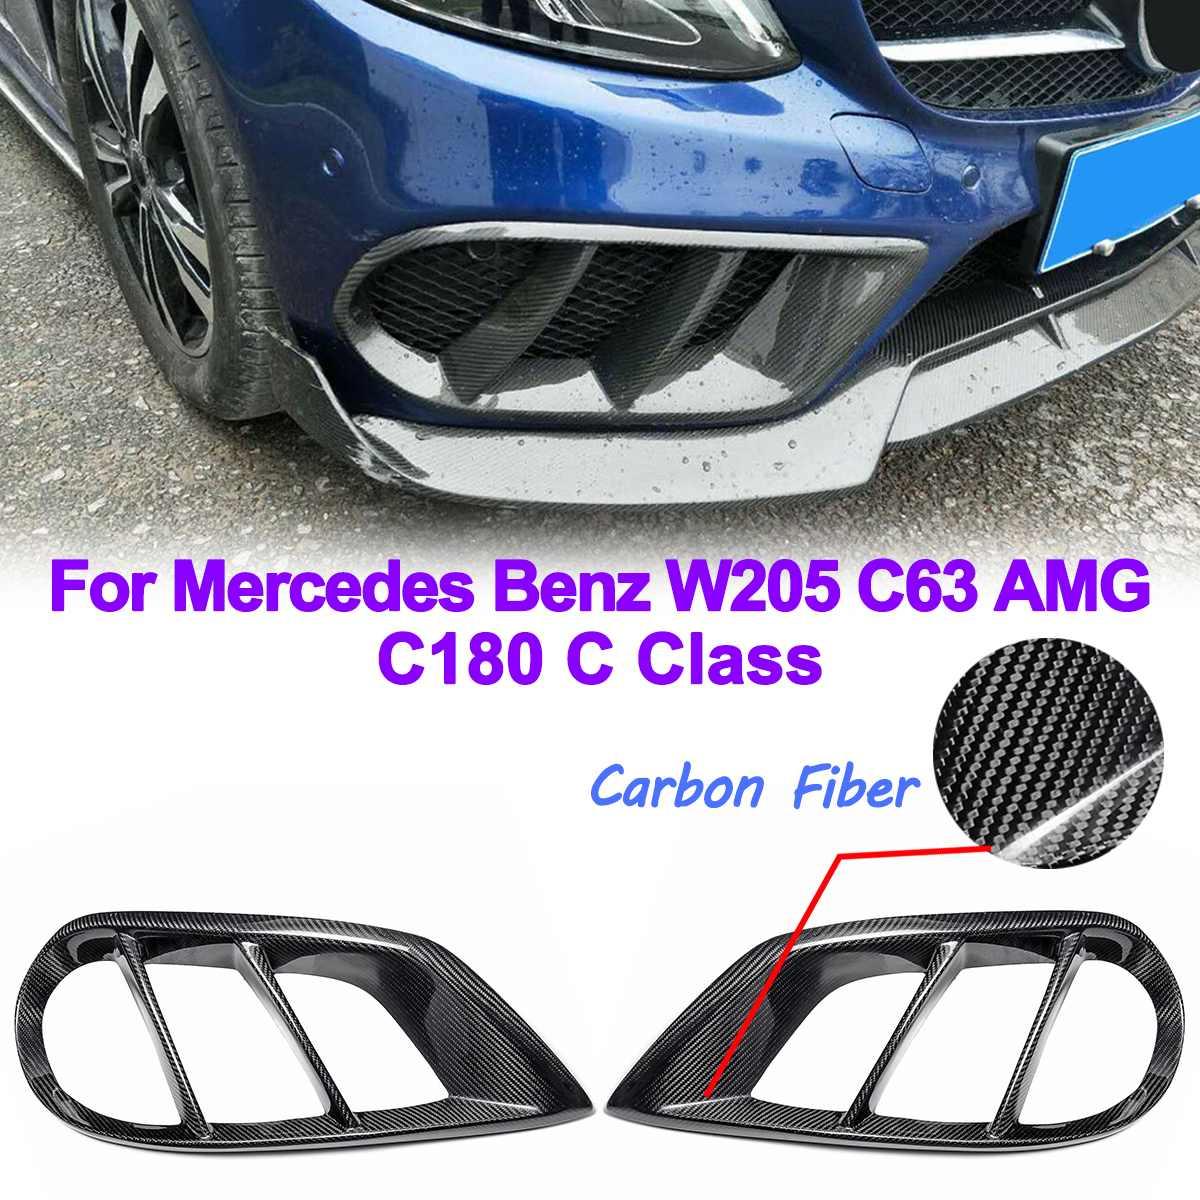 Front Bumper Air Vent Grill Fog Light Cover Carbon Fiber Trim for Mercedes for Benz W205 C43 for AMG 2015-2018 Exterior PartsFront Bumper Air Vent Grill Fog Light Cover Carbon Fiber Trim for Mercedes for Benz W205 C43 for AMG 2015-2018 Exterior Parts